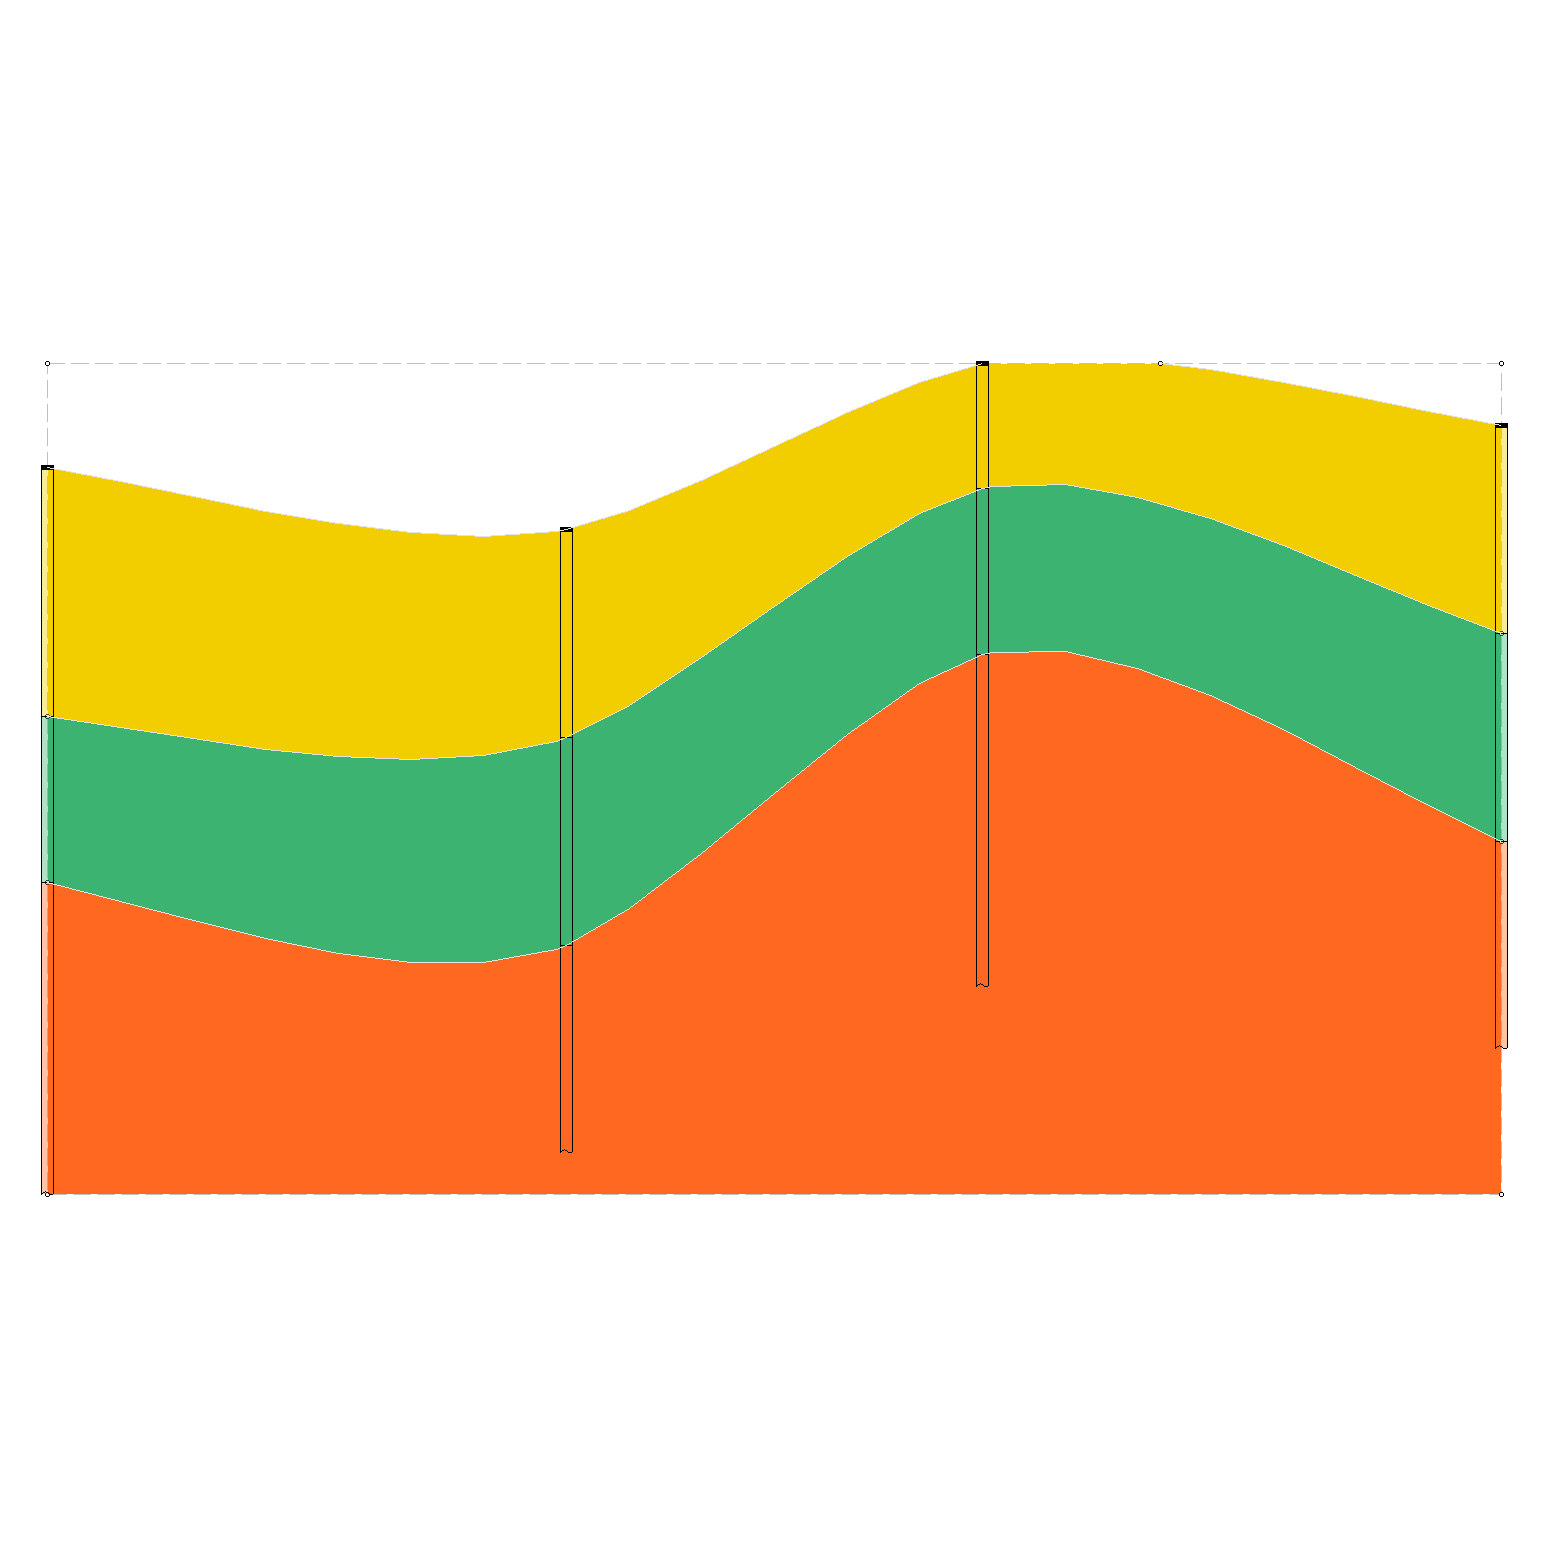 Easily create soil profile and interpolate between boreholes.